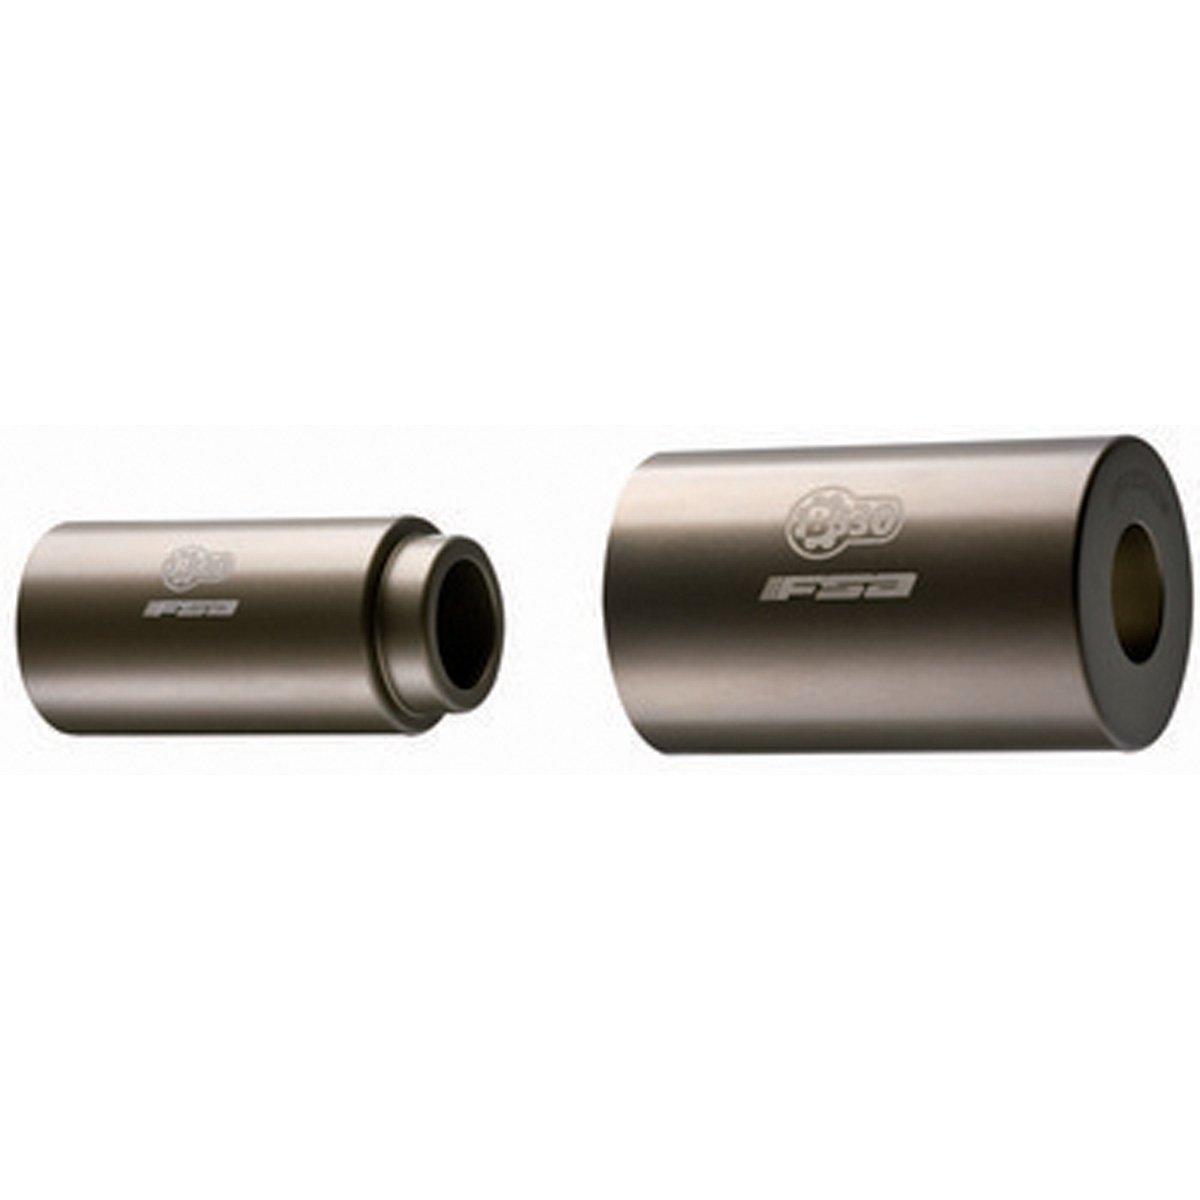 FSA BB-30 English Adaptor EE039 Bottom Bracket Removal Tool - 800-0010